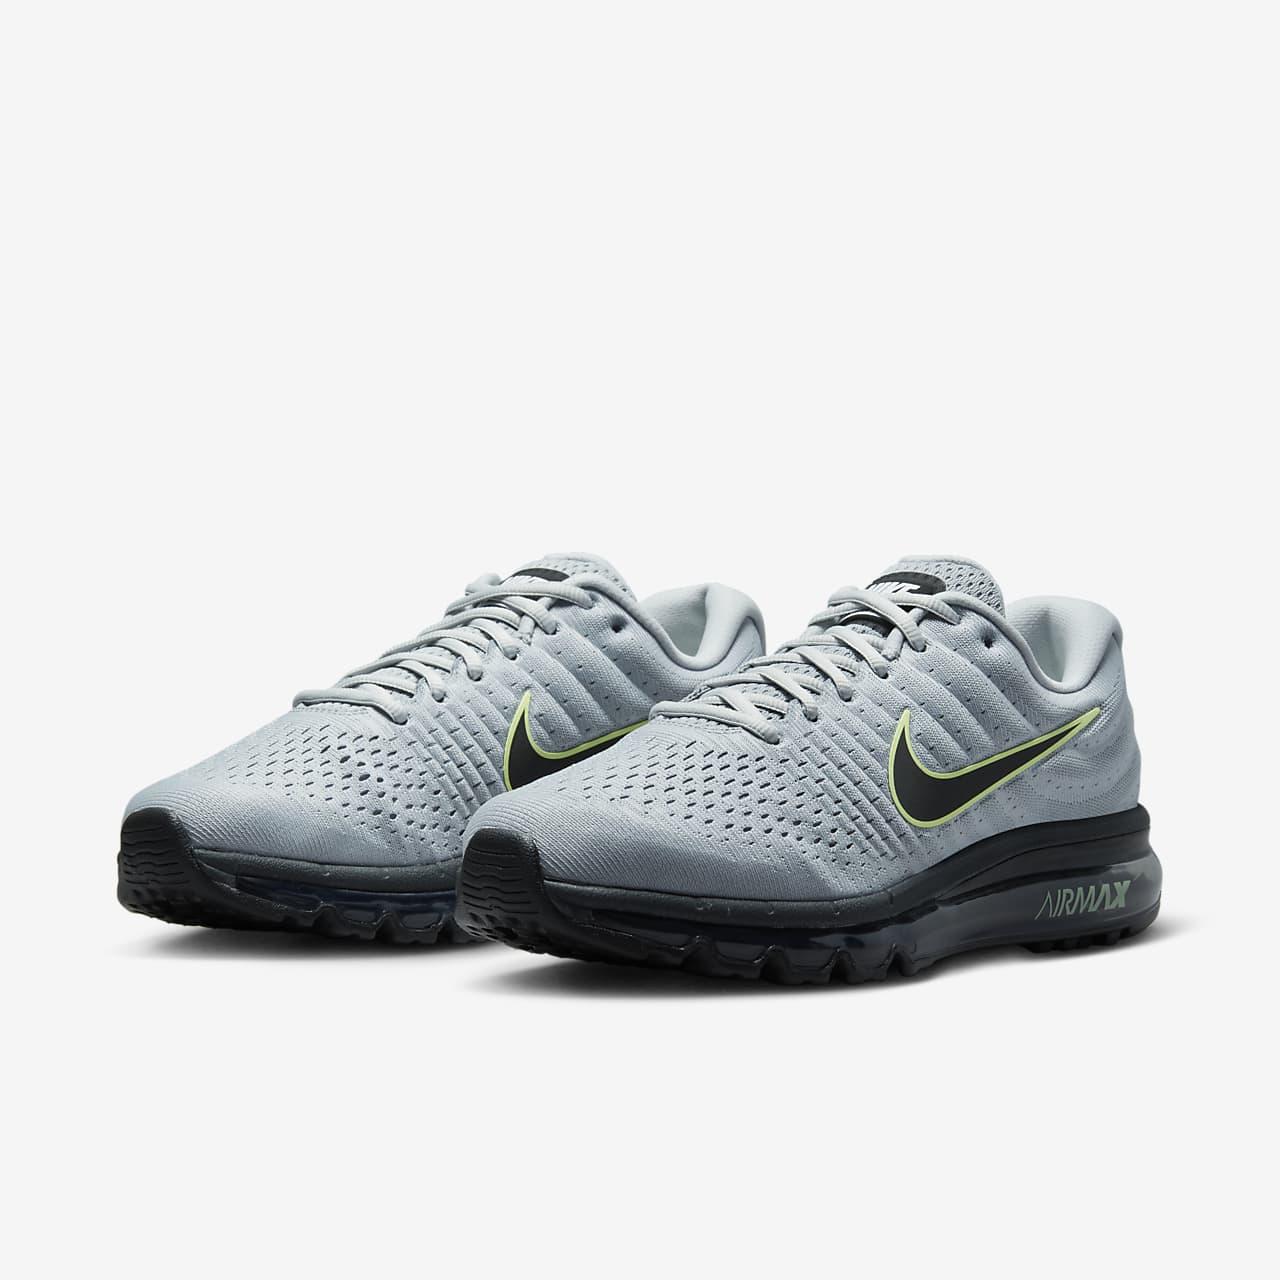 sports shoes 2b253 2cfd0 ... Calzado para hombre Nike Air Max 2017